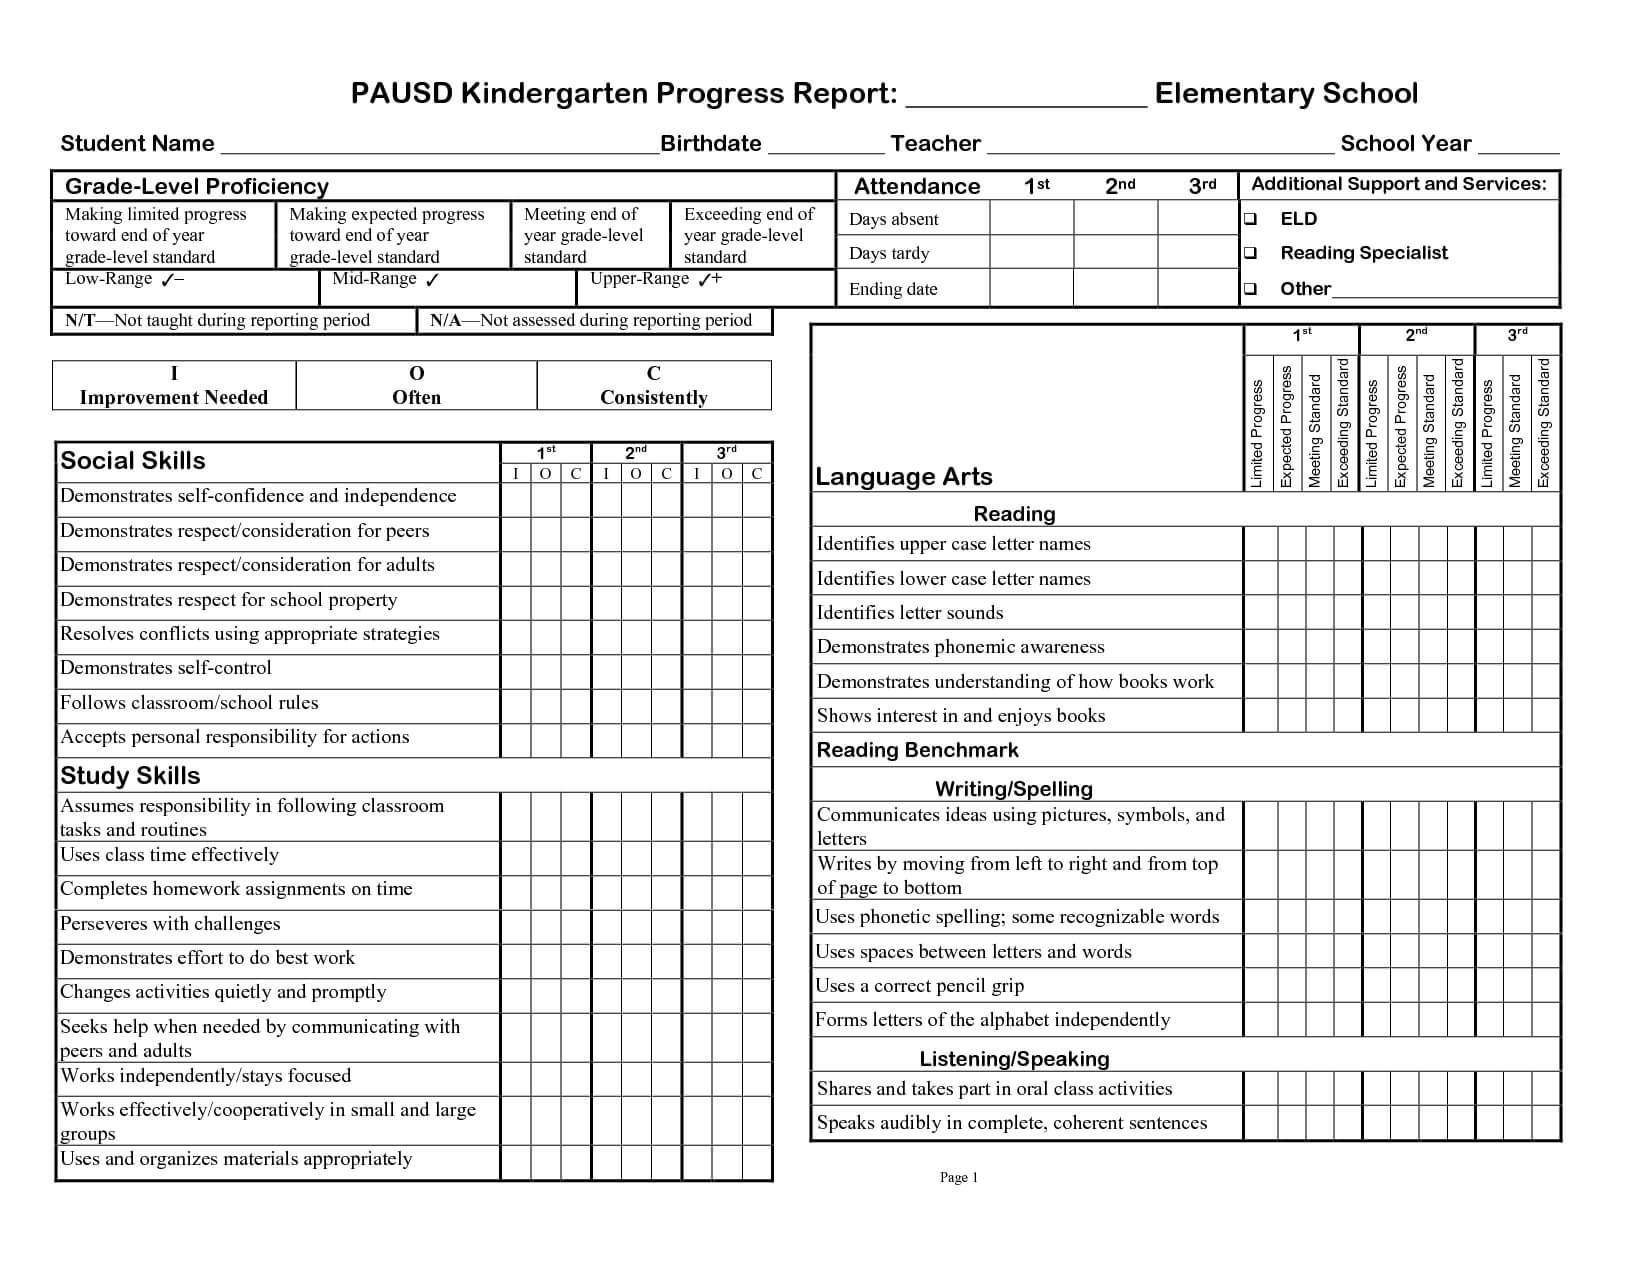 Kindergarten Social Skills Progress Report Blank Templates Within Summer School Progress Report Template